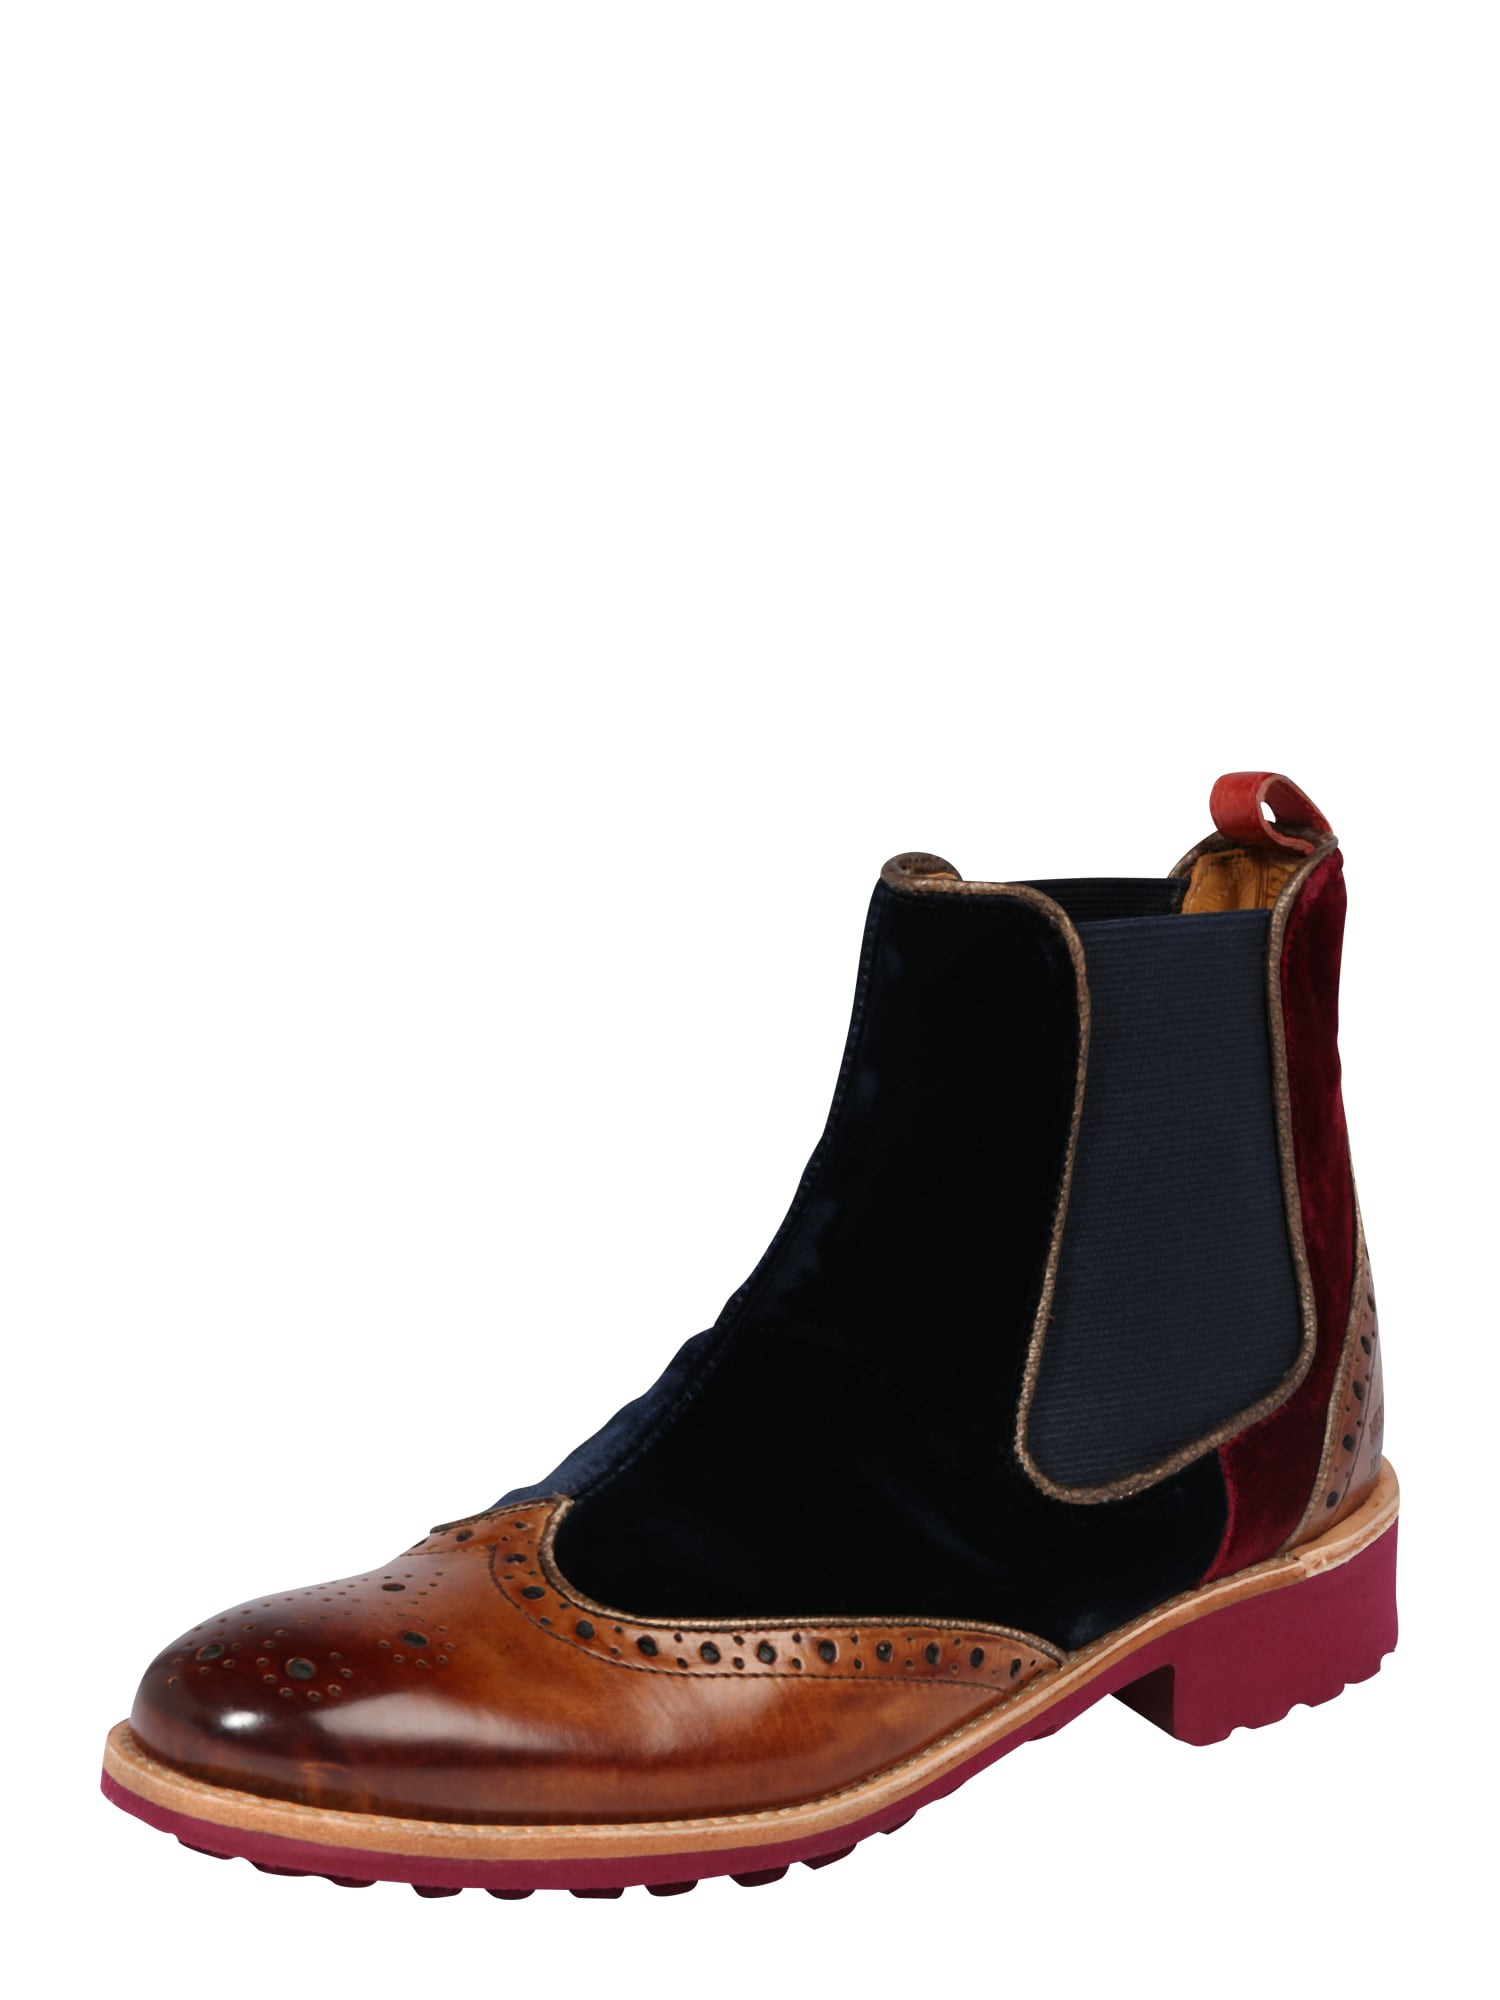 Chelsea boty Amelie 43 hnědá černá MELVIN & HAMILTON